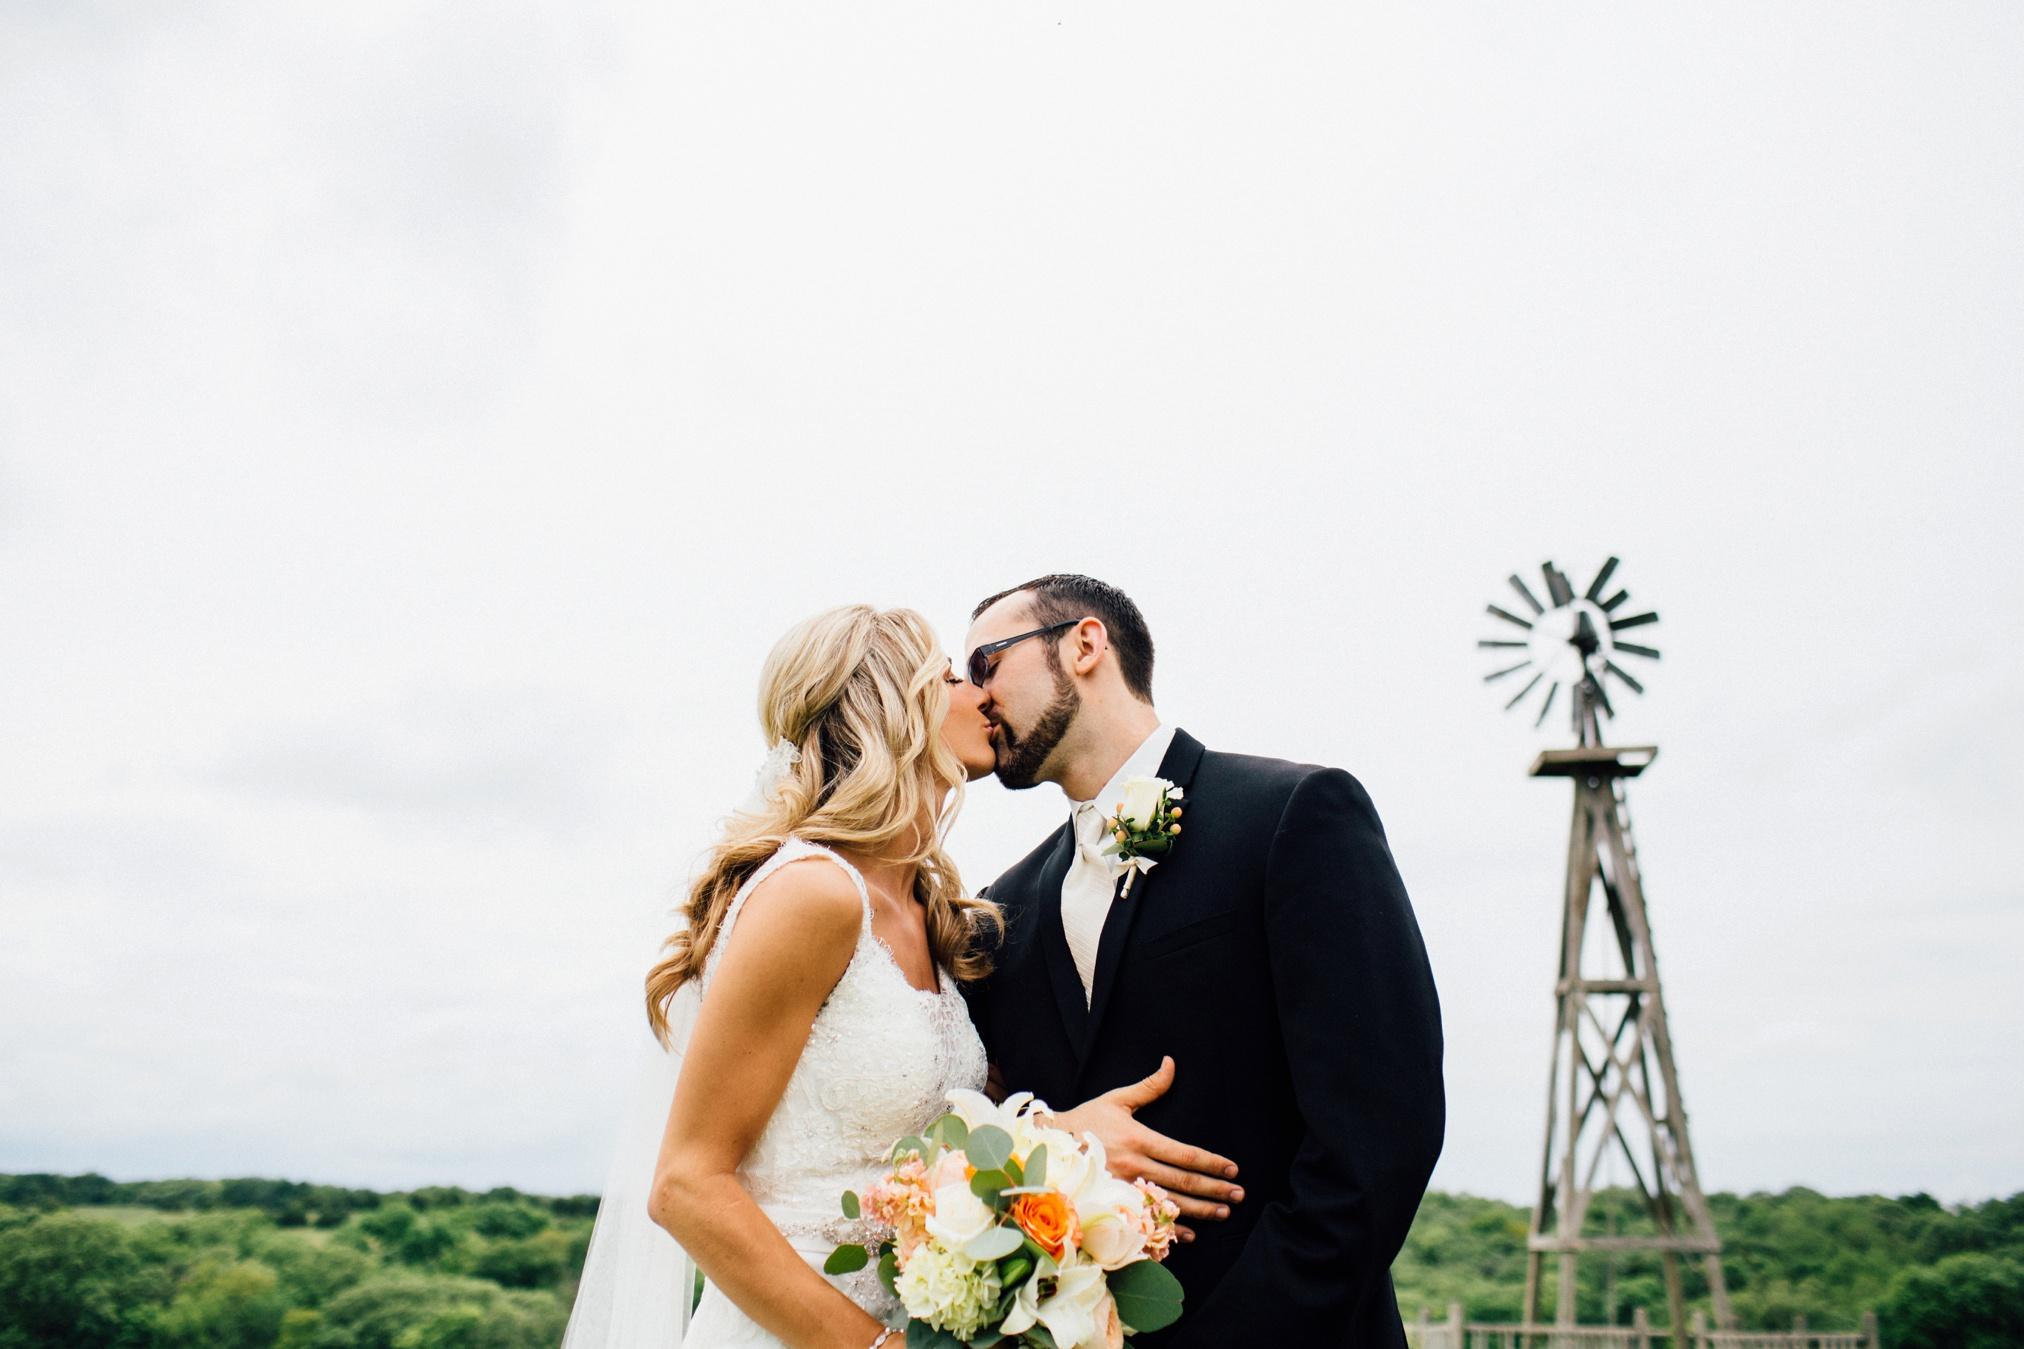 schmid_wedding-631.jpg